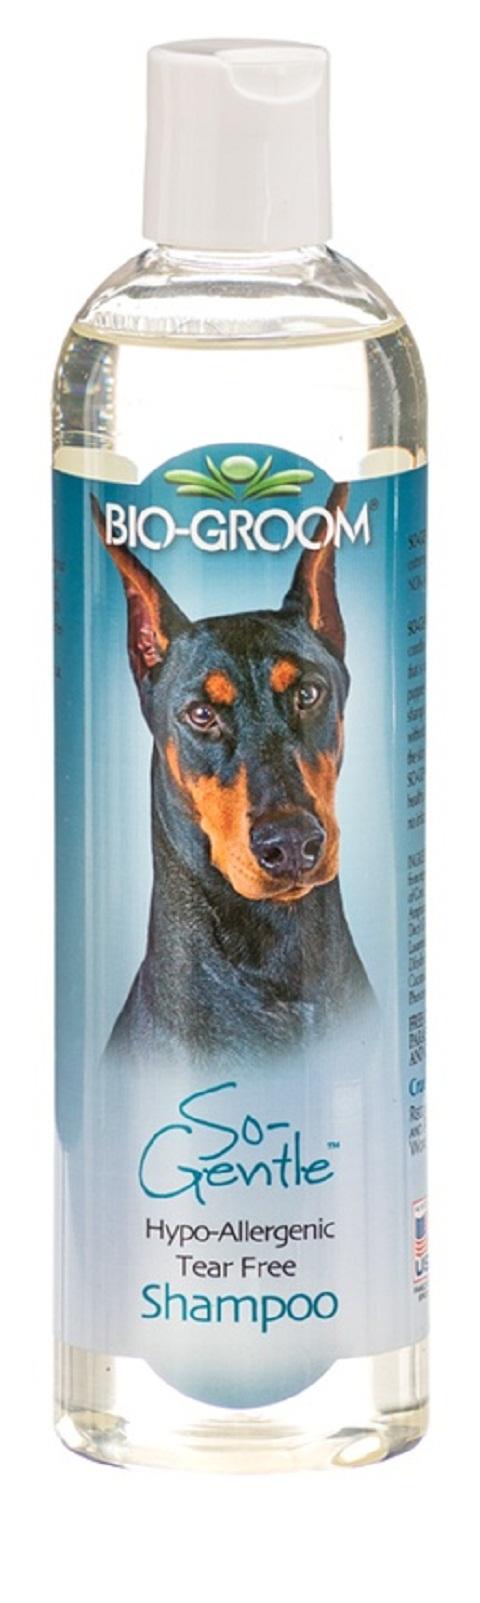 Bio-groom So-gentle Shampoo – Био-грум шампунь для собак гипоаллергенный (355 мл)